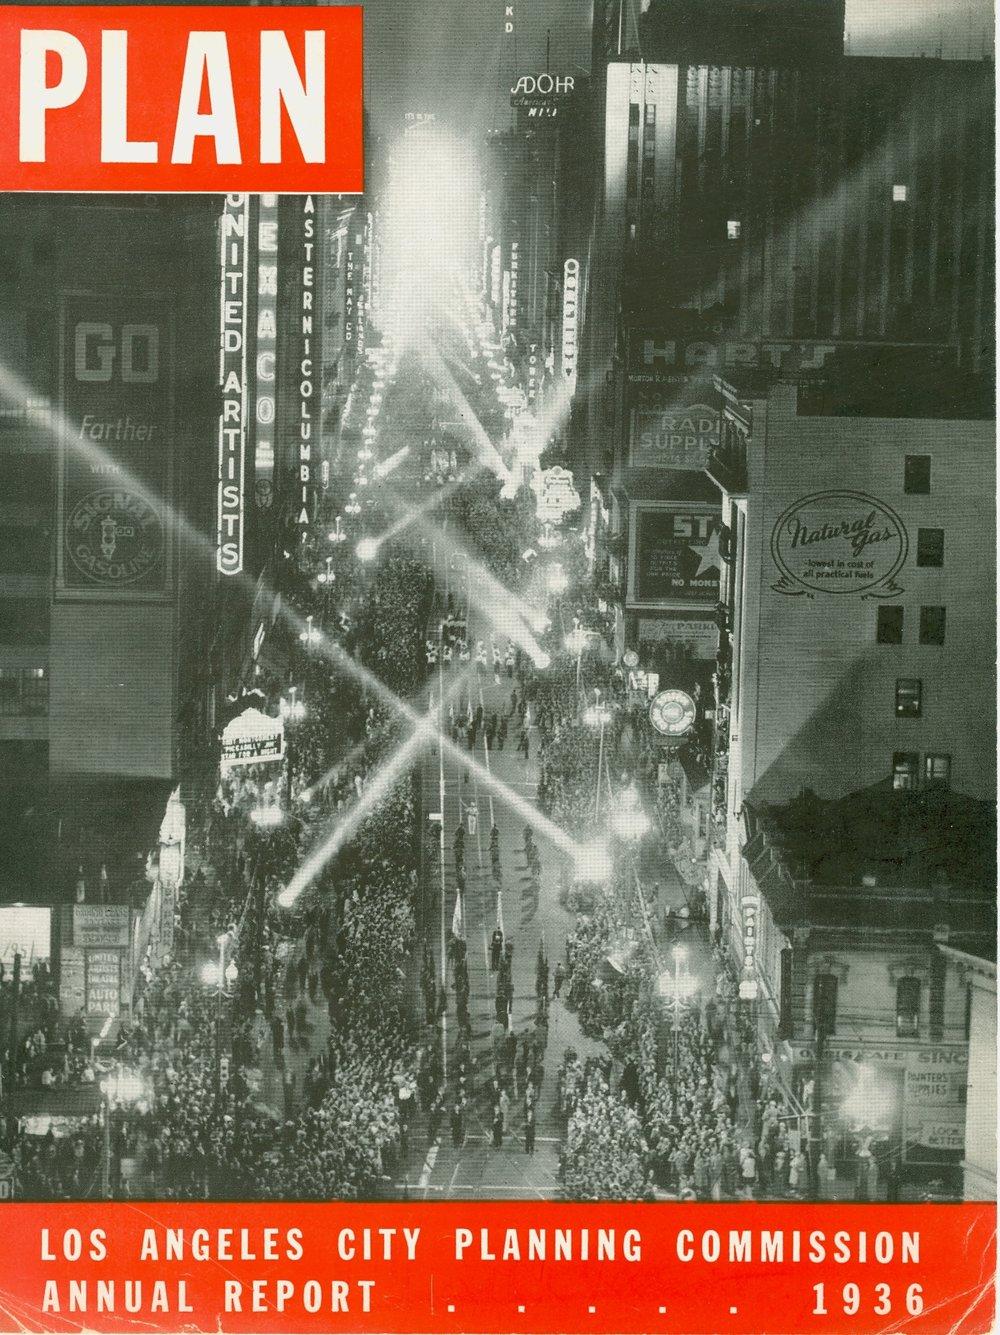 plan-cover-broadway-1936_4277285722_o.jpg